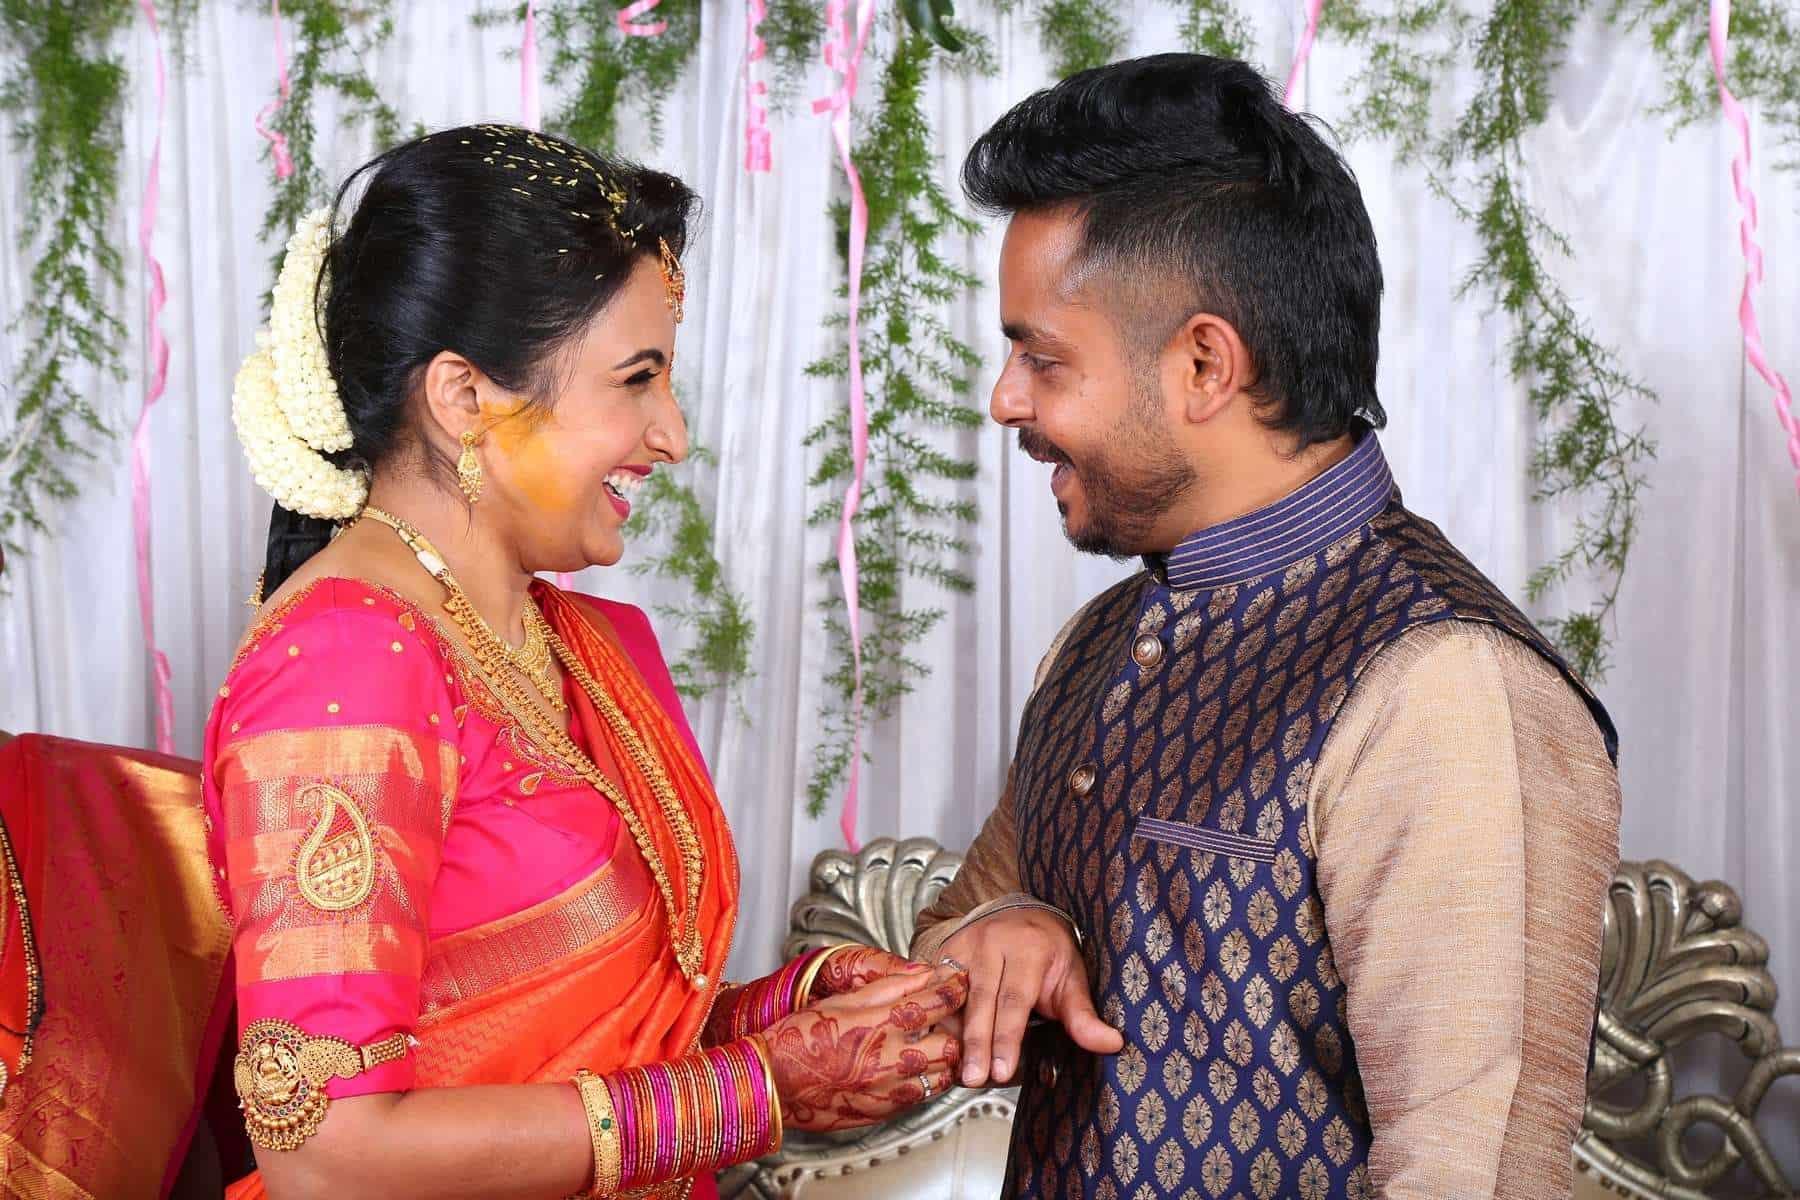 Darshan Digital Studio Photos Basaveshwara Nagar Bangalore Wedding Video Shooting Services